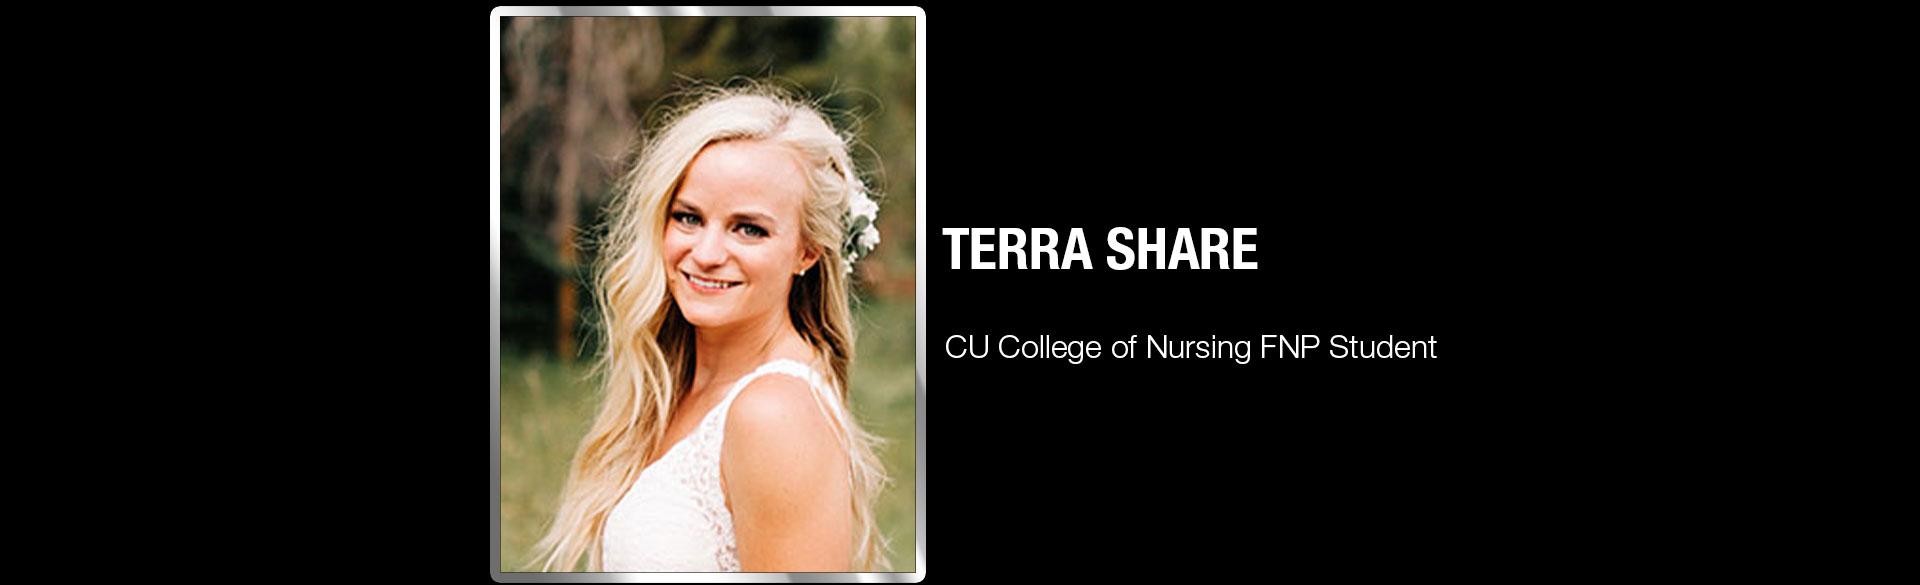 Terra Share, CU College of Nursing FNP Student